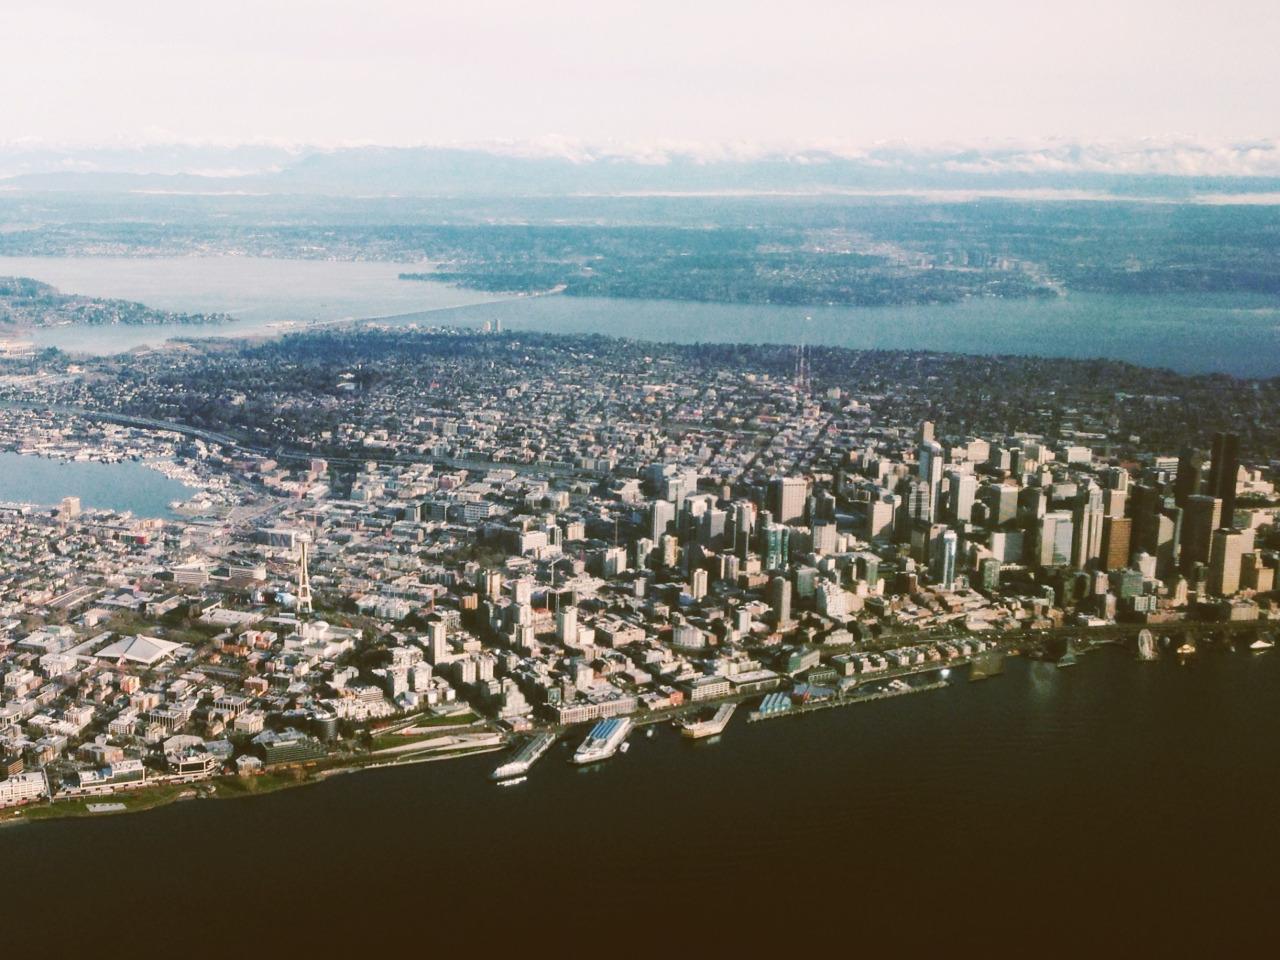 Seattle below the clouds